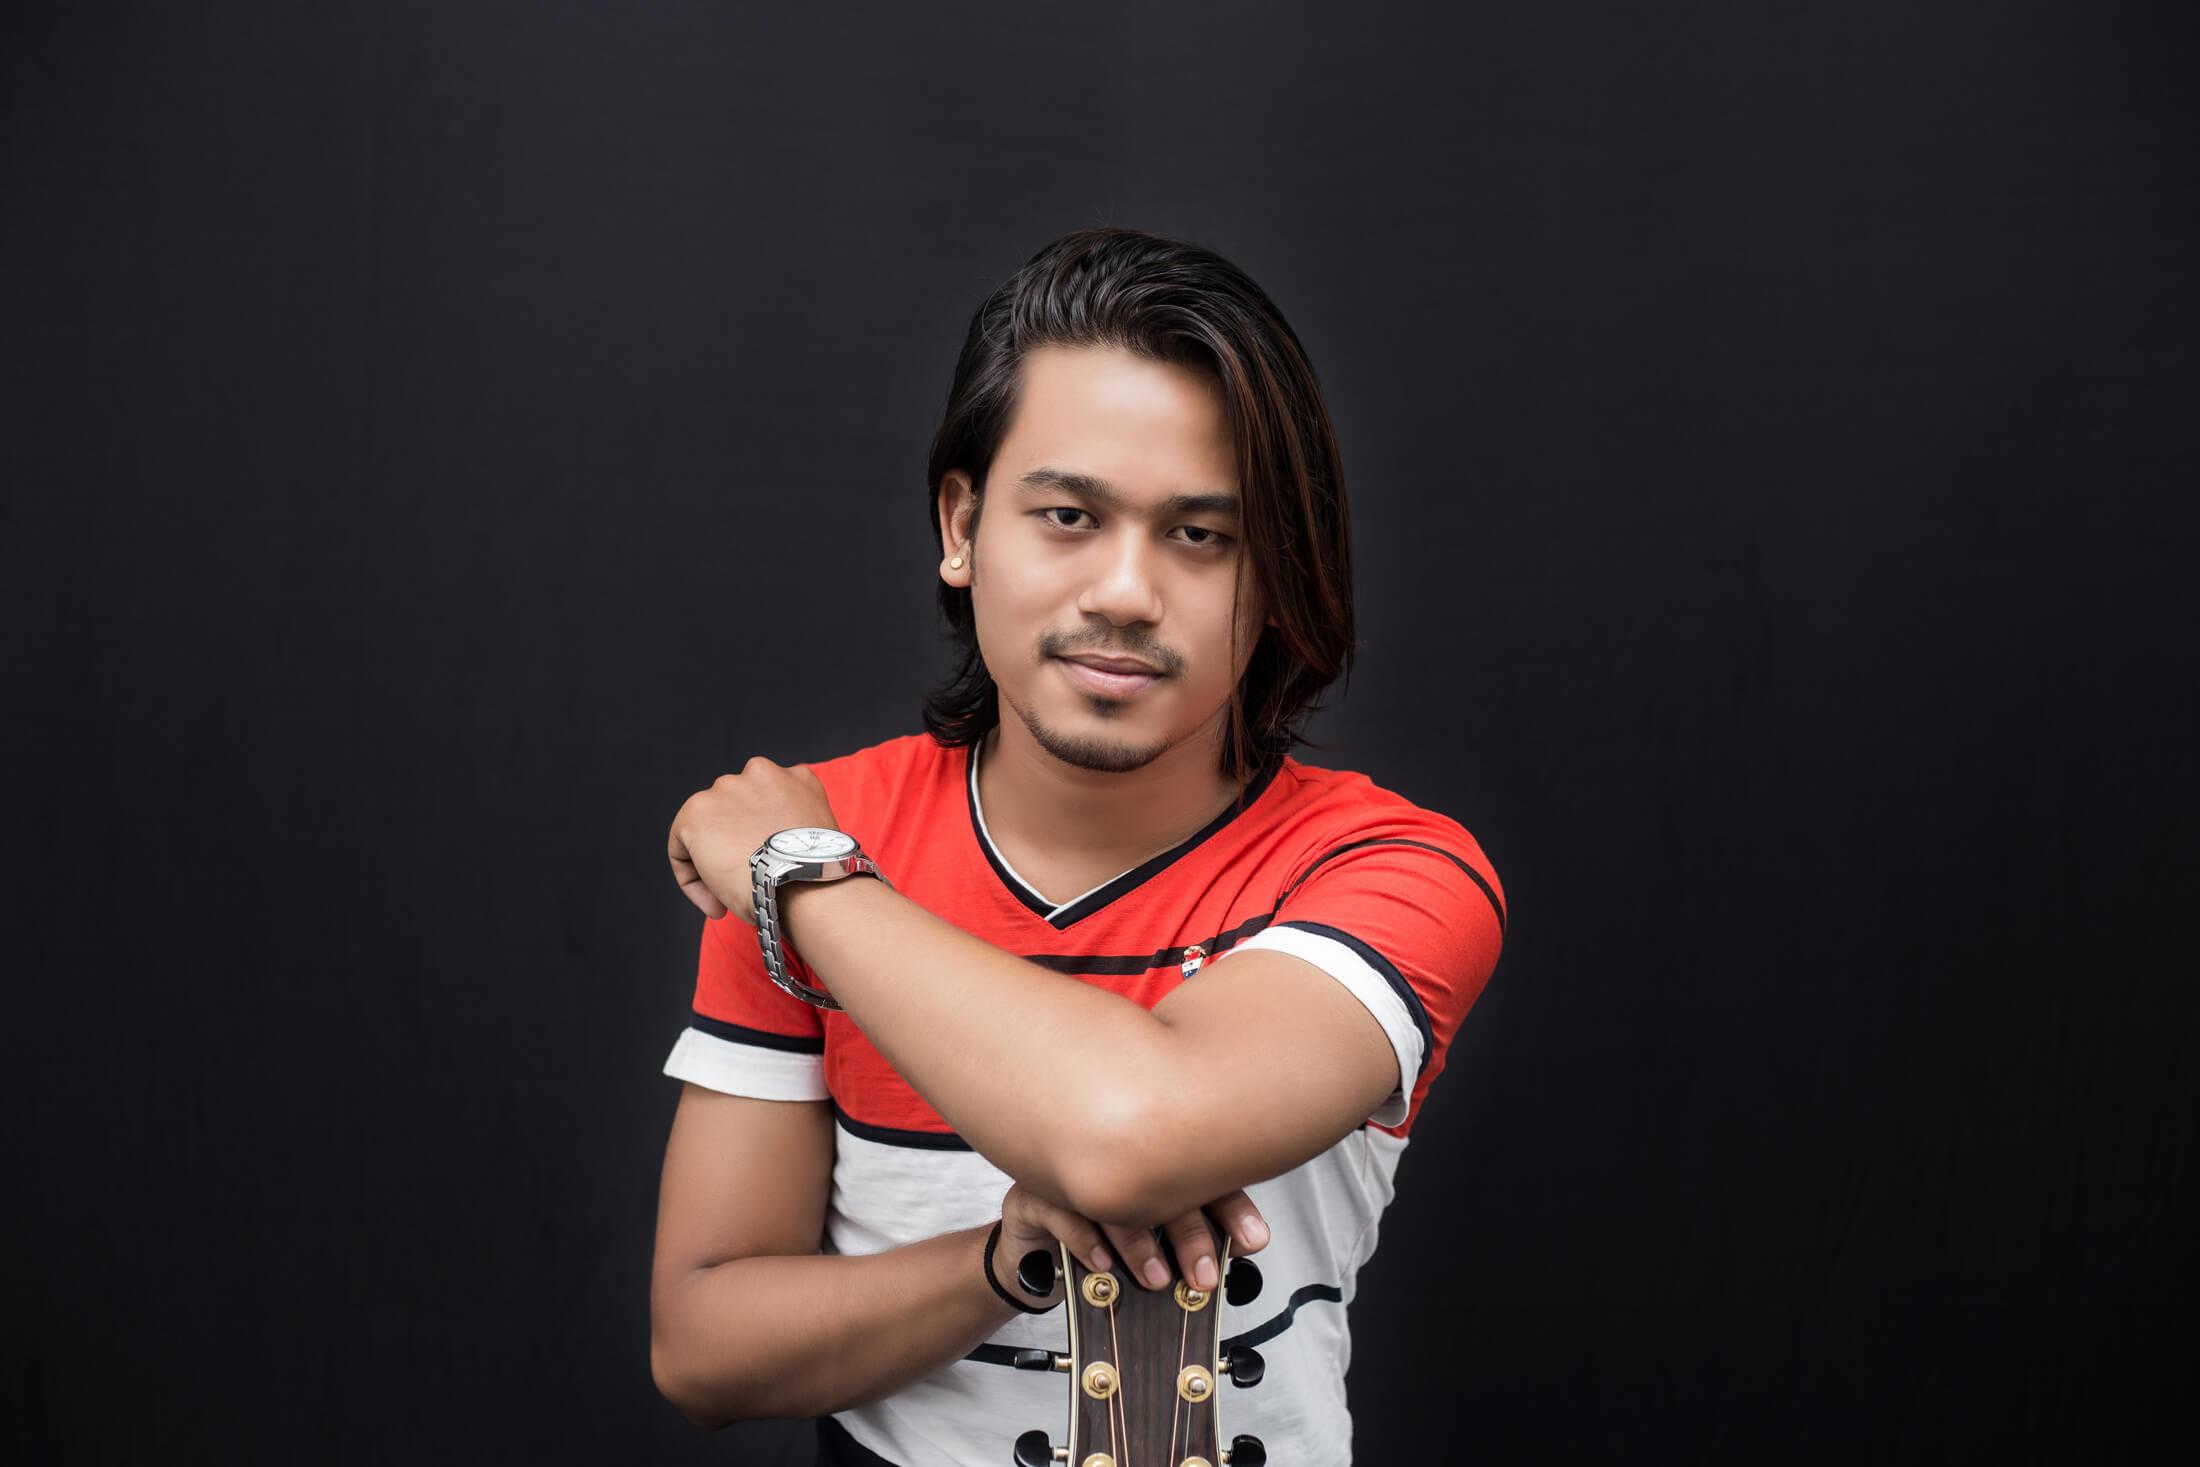 Suraj Bhujel